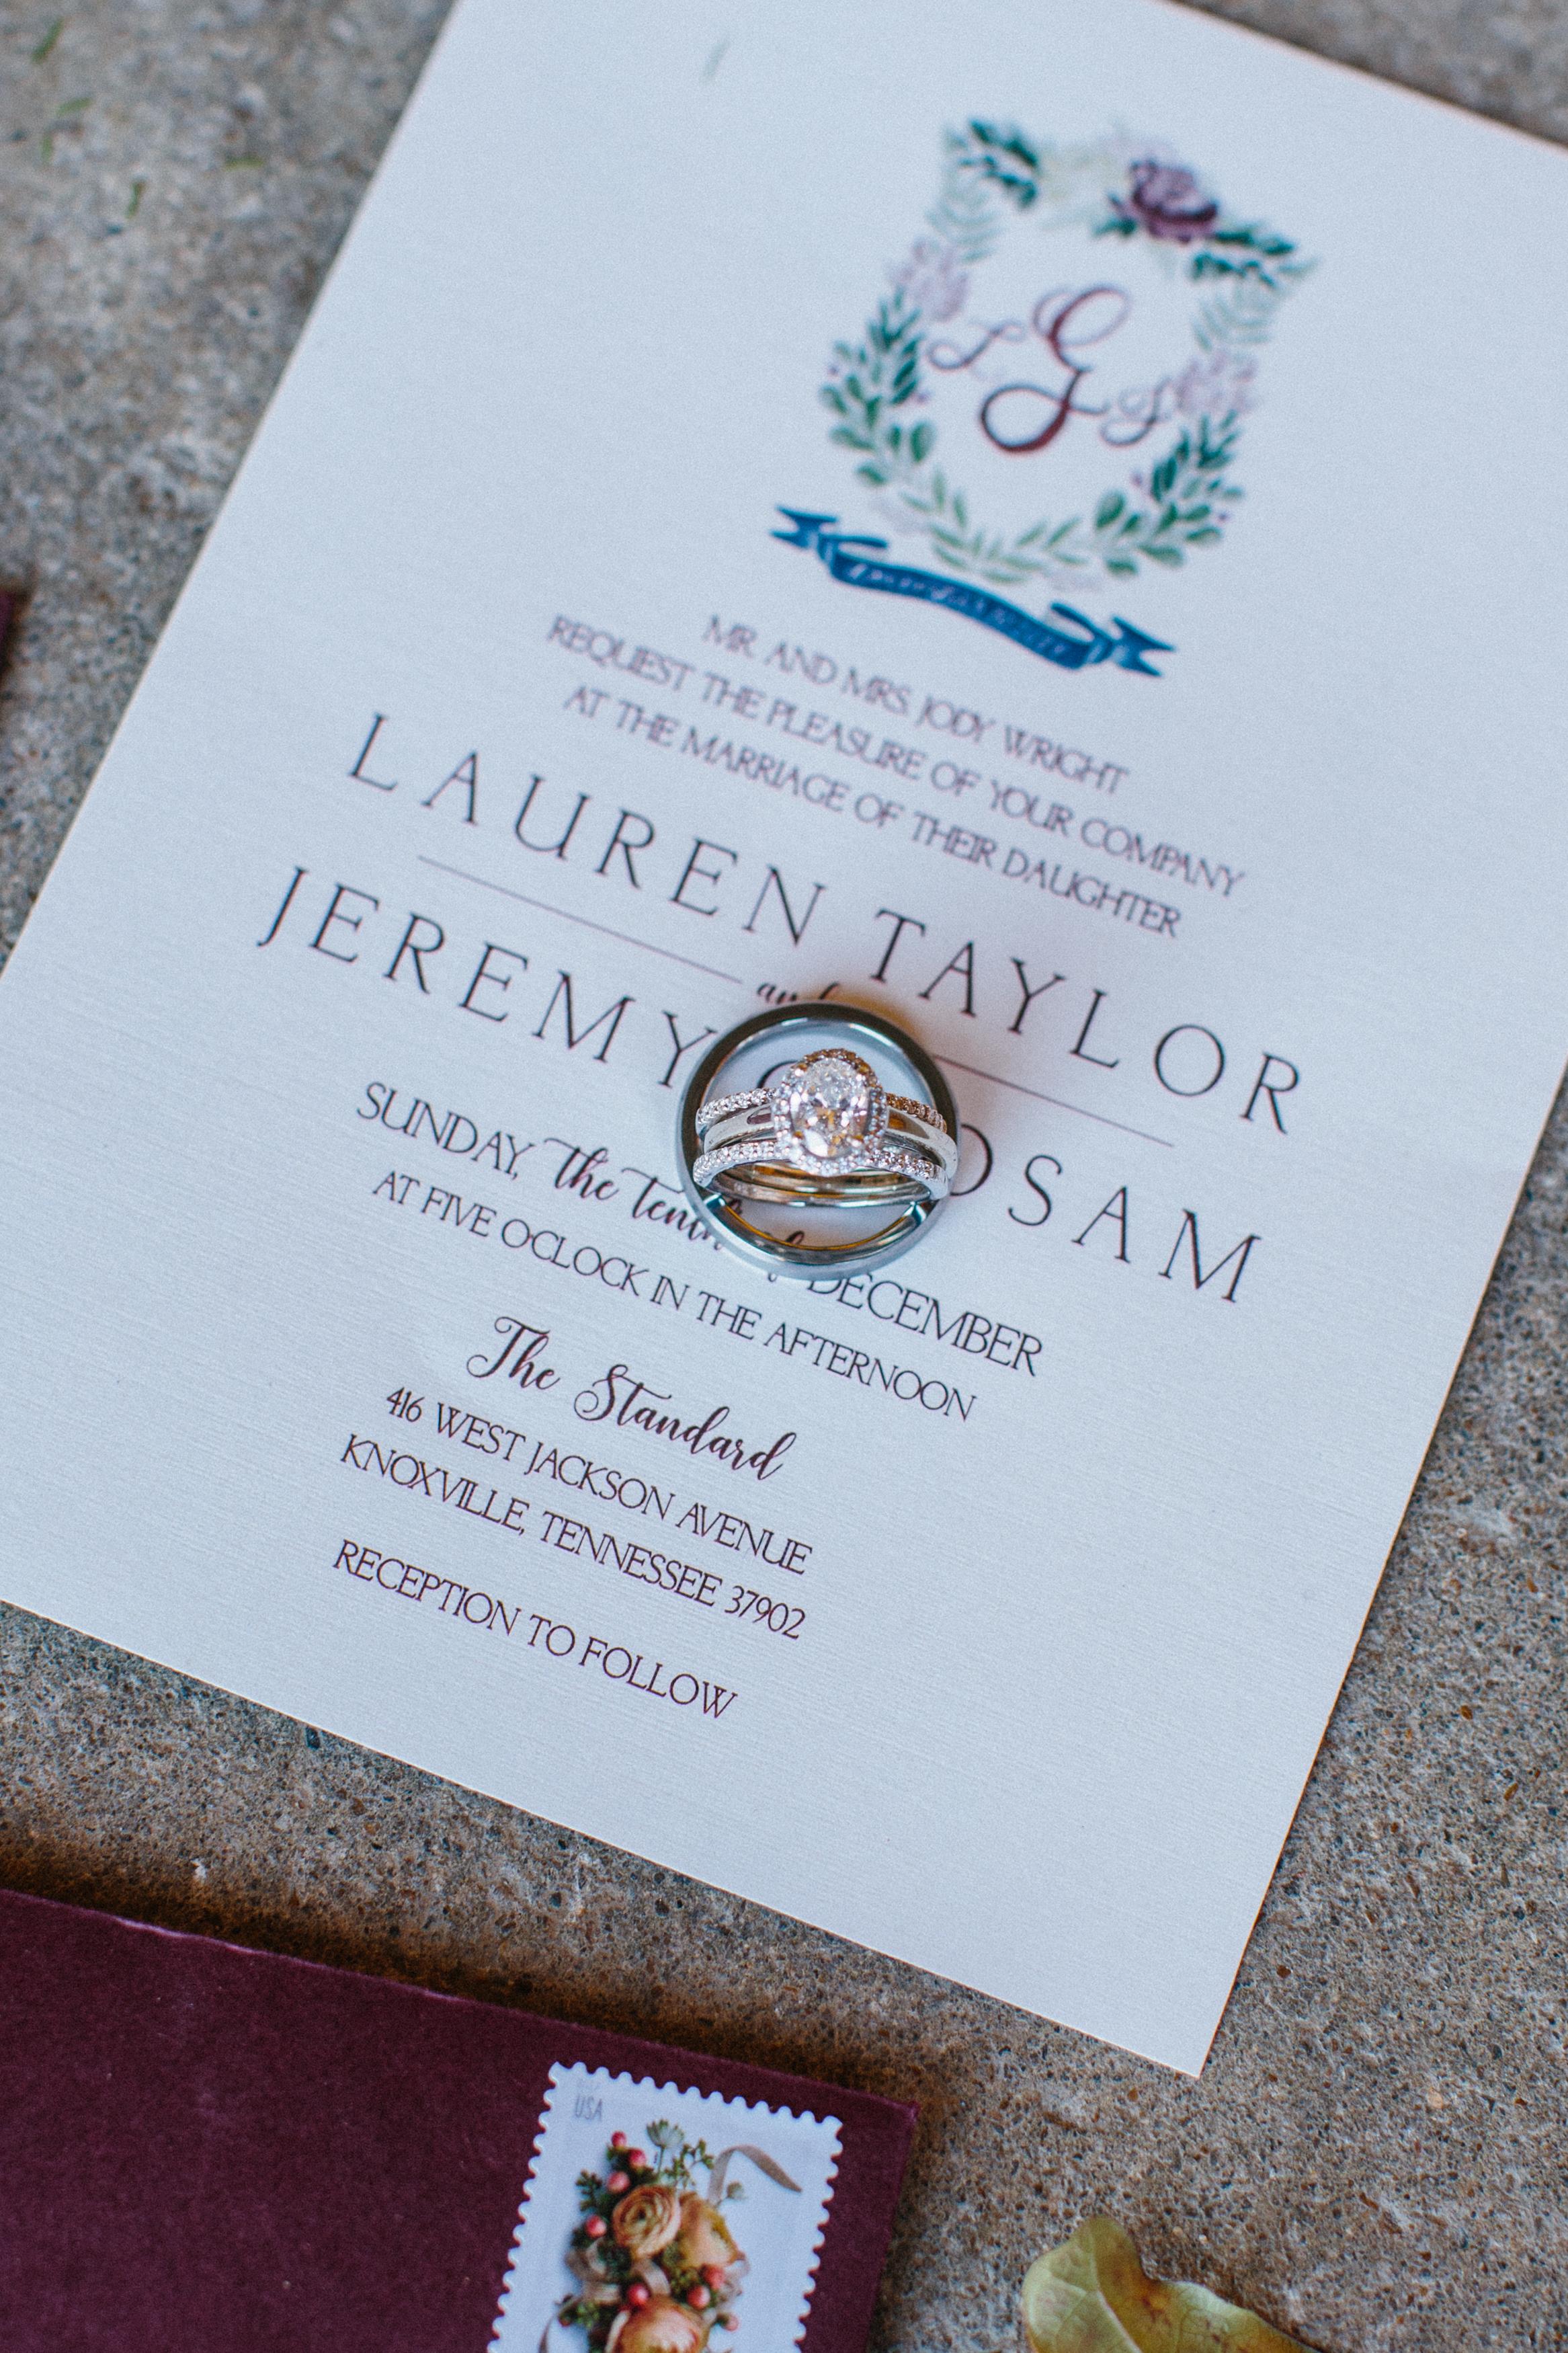 Lauren_Jeremy_Standard_Wedding_Knoxville_Abigail_Malone_Photography_FIlm-23.jpg